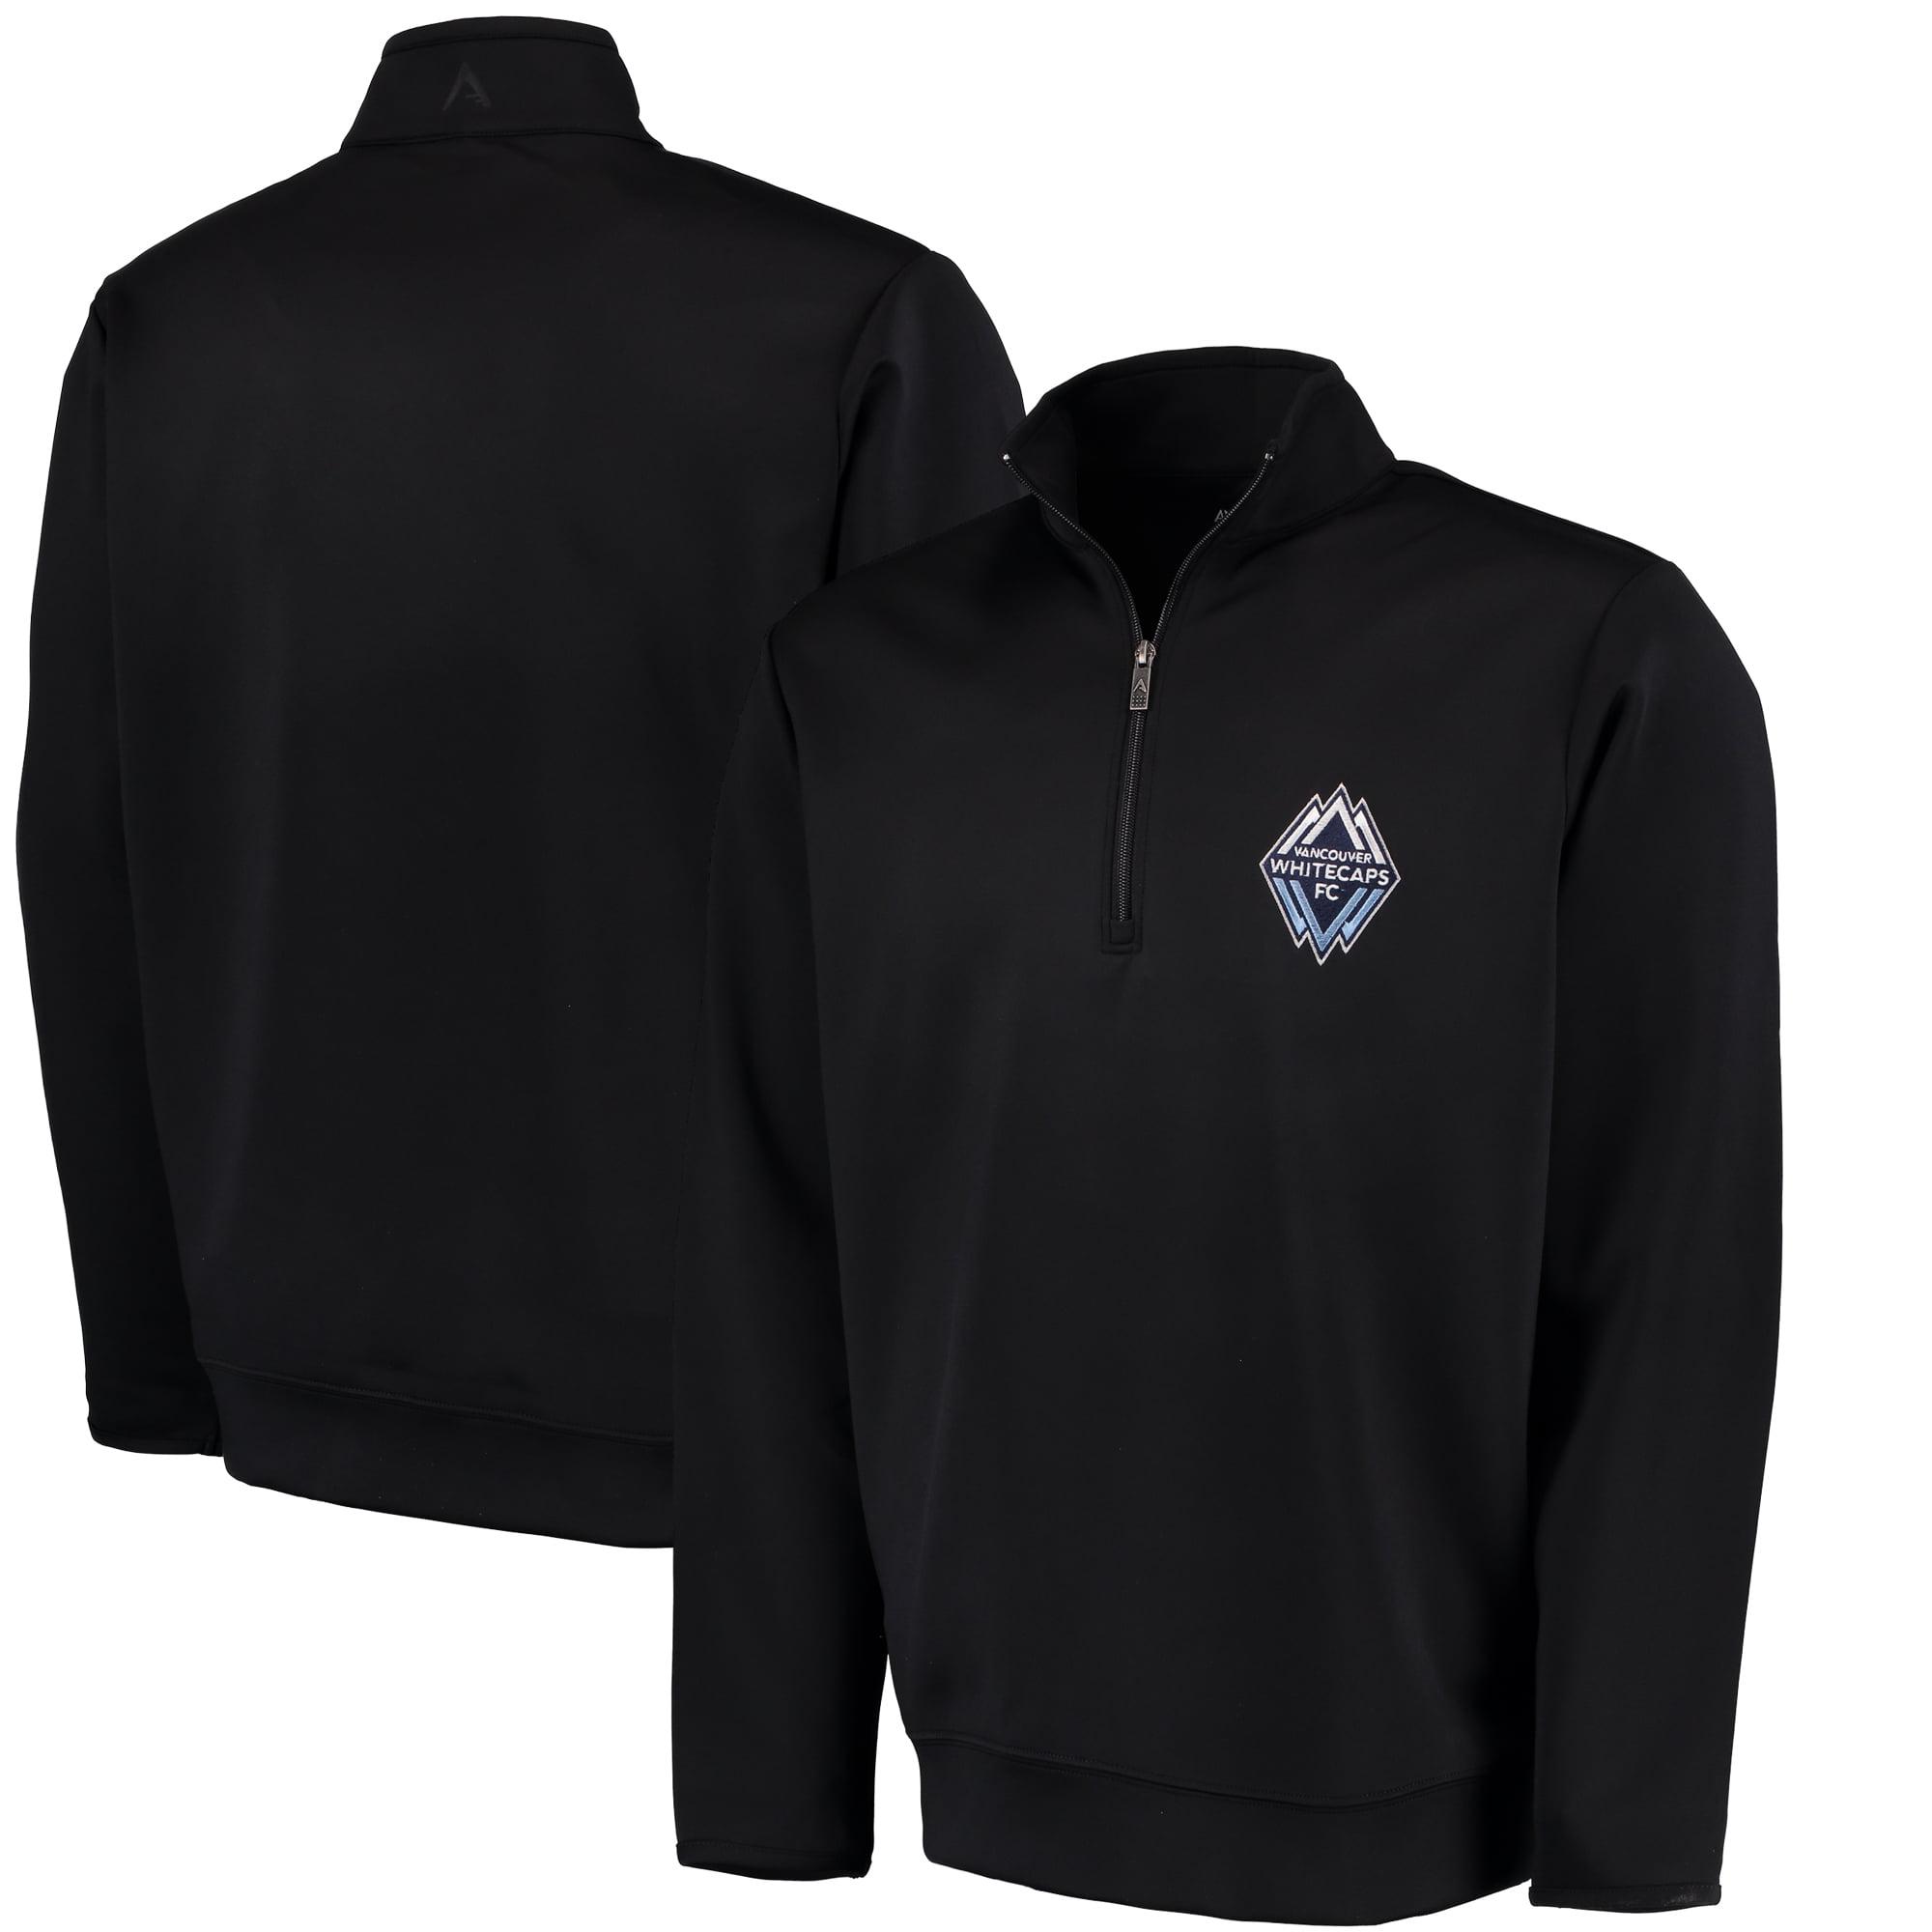 Vancouver Whitecaps FC Antigua Leader Quarter-Zip Pullover Jacket - Black